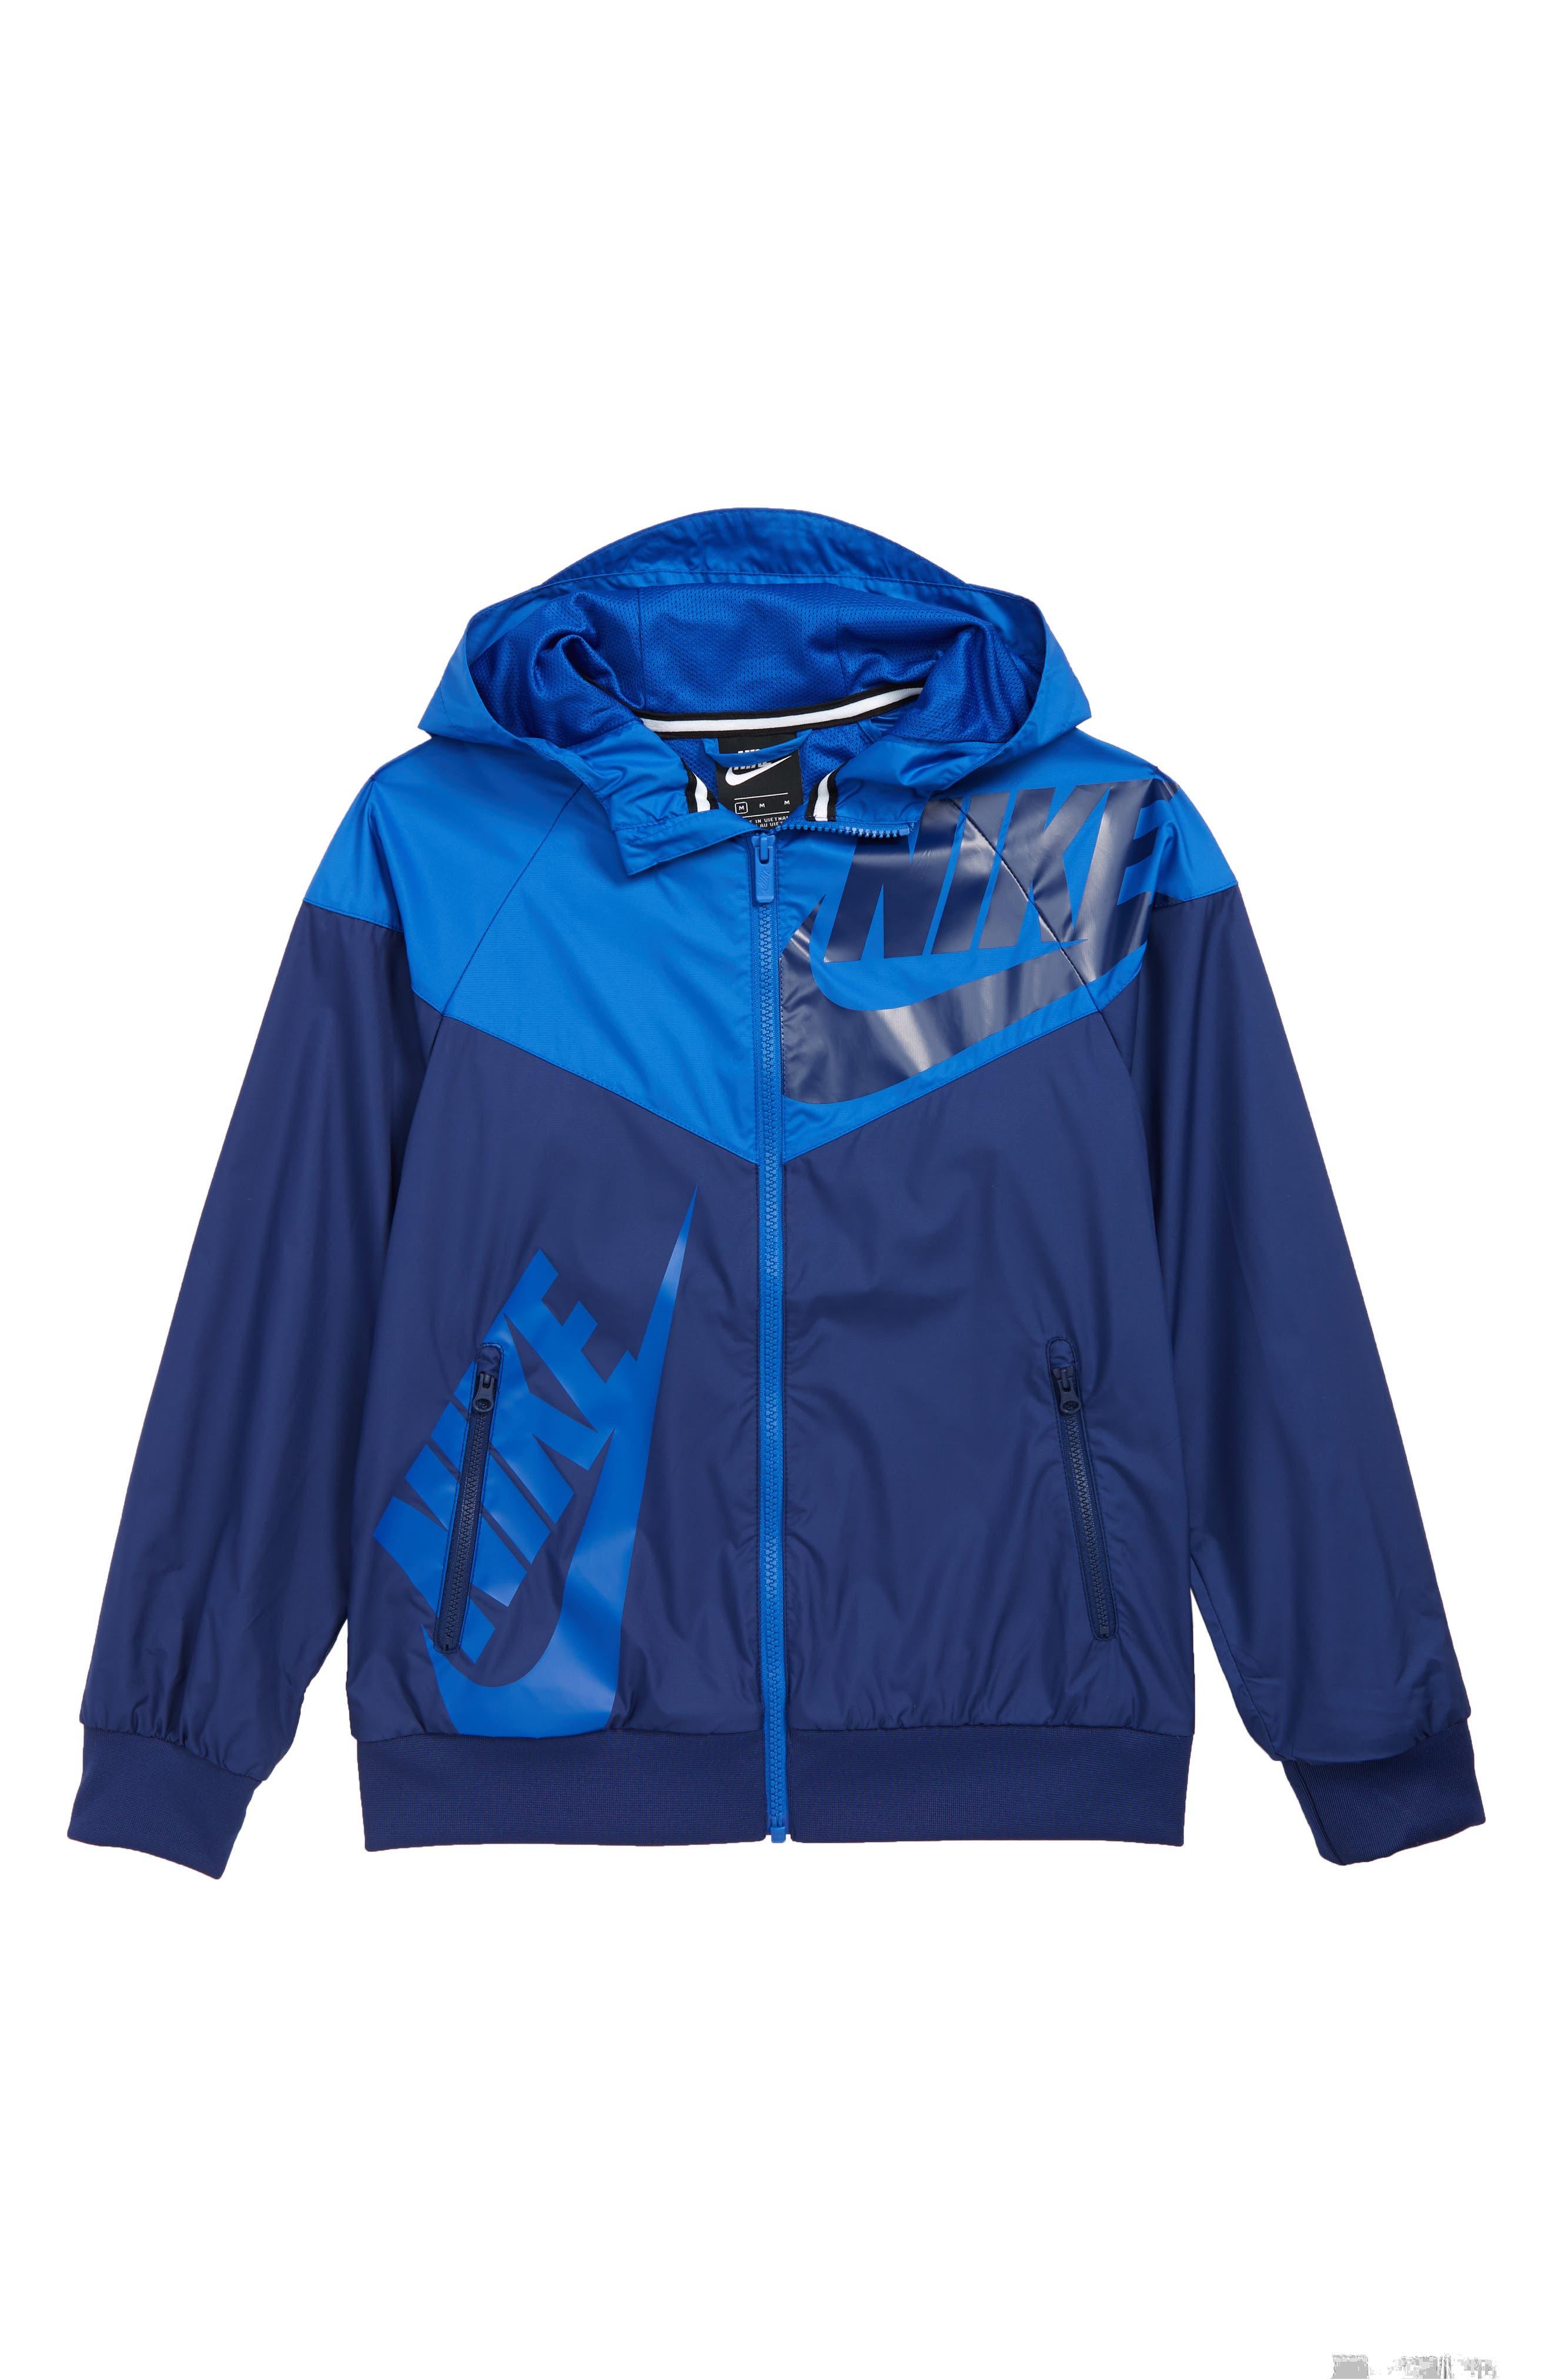 NIKE, Sportswear Windrunner Zip Jacket, Main thumbnail 1, color, BLUE VOID/ GAME ROYAL